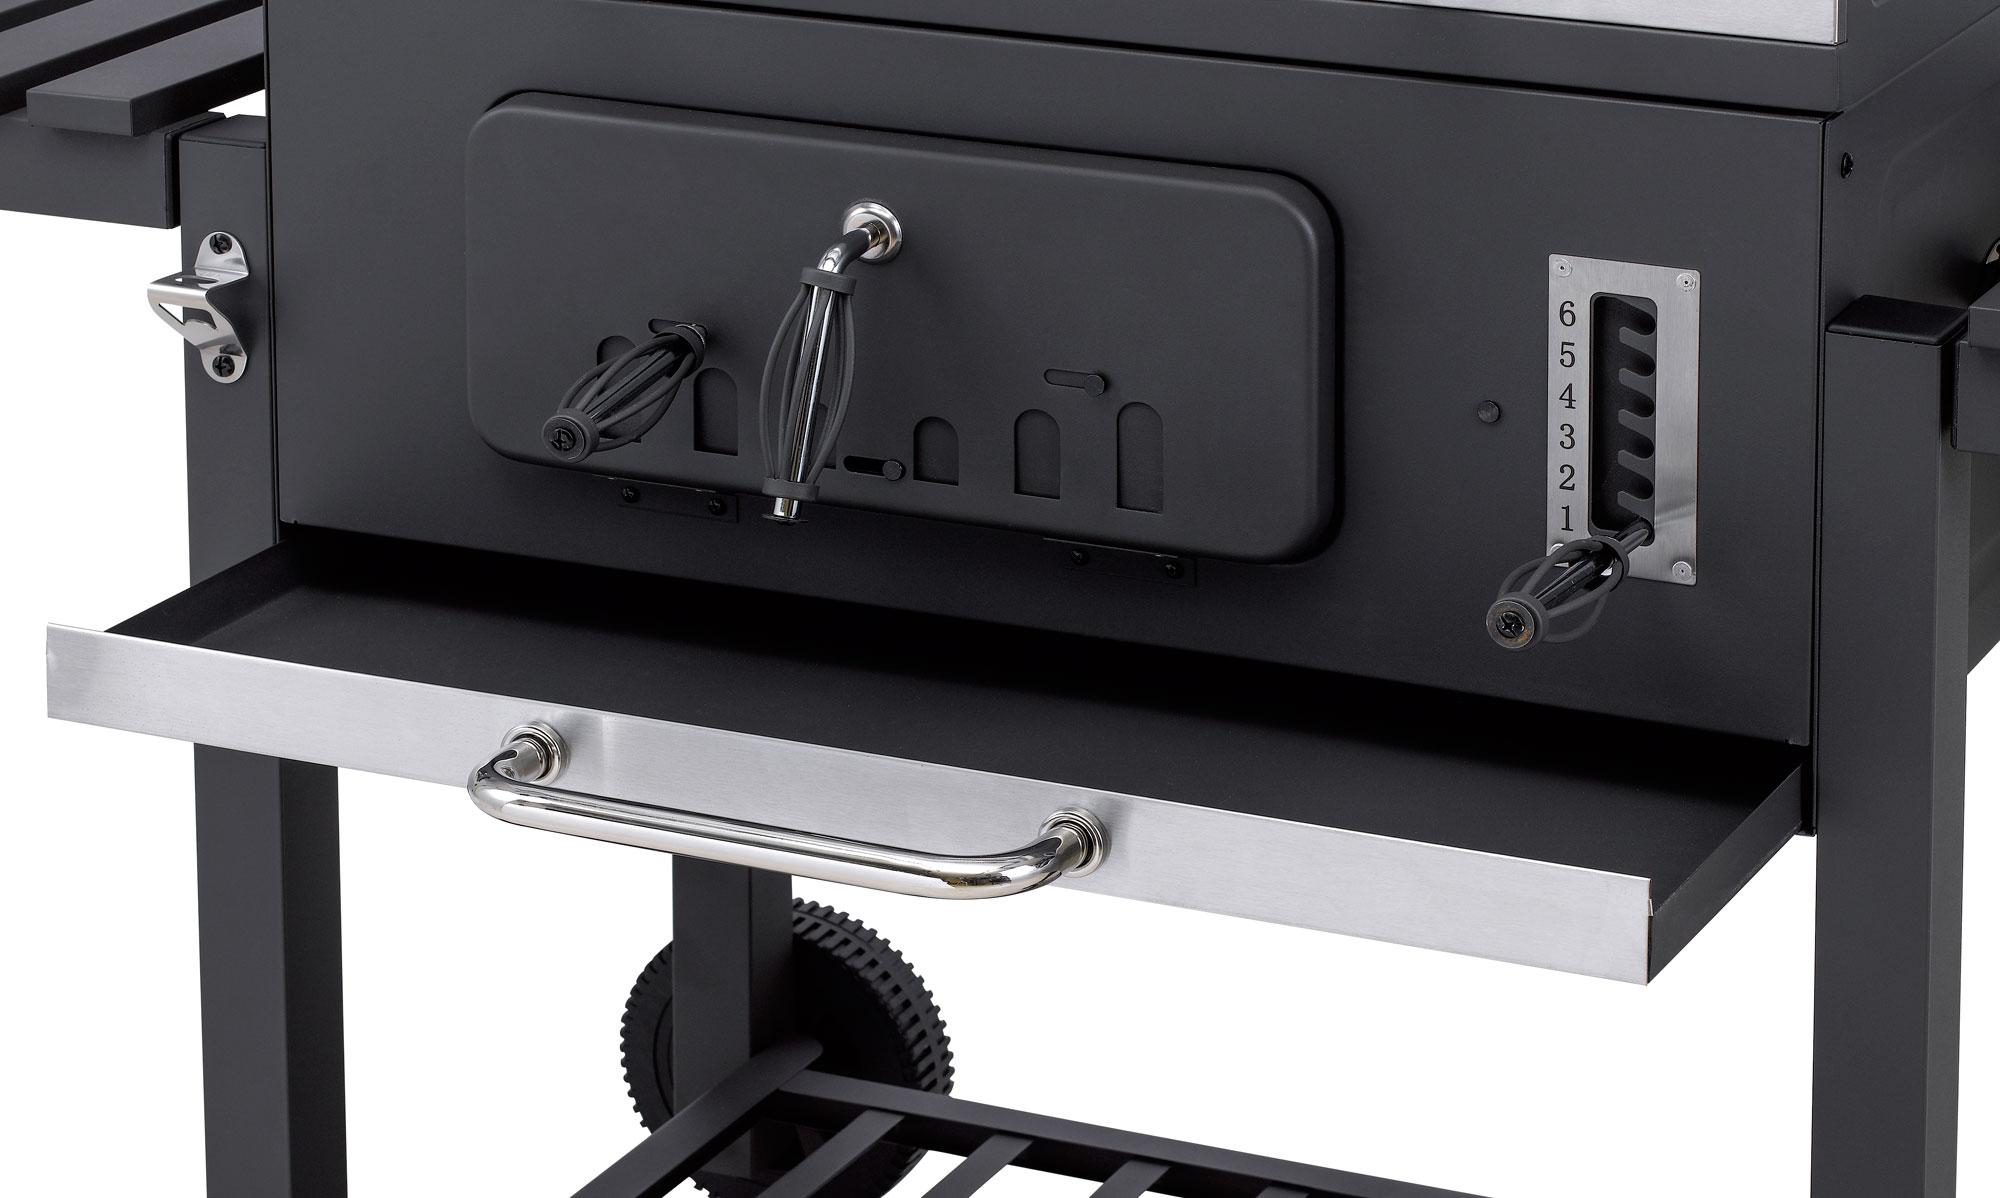 Tepro Toronto Holzkohlegrill Mit Grillrosteinsatz : Tepro holzkohlegrill grillwagen toronto click grillfläche